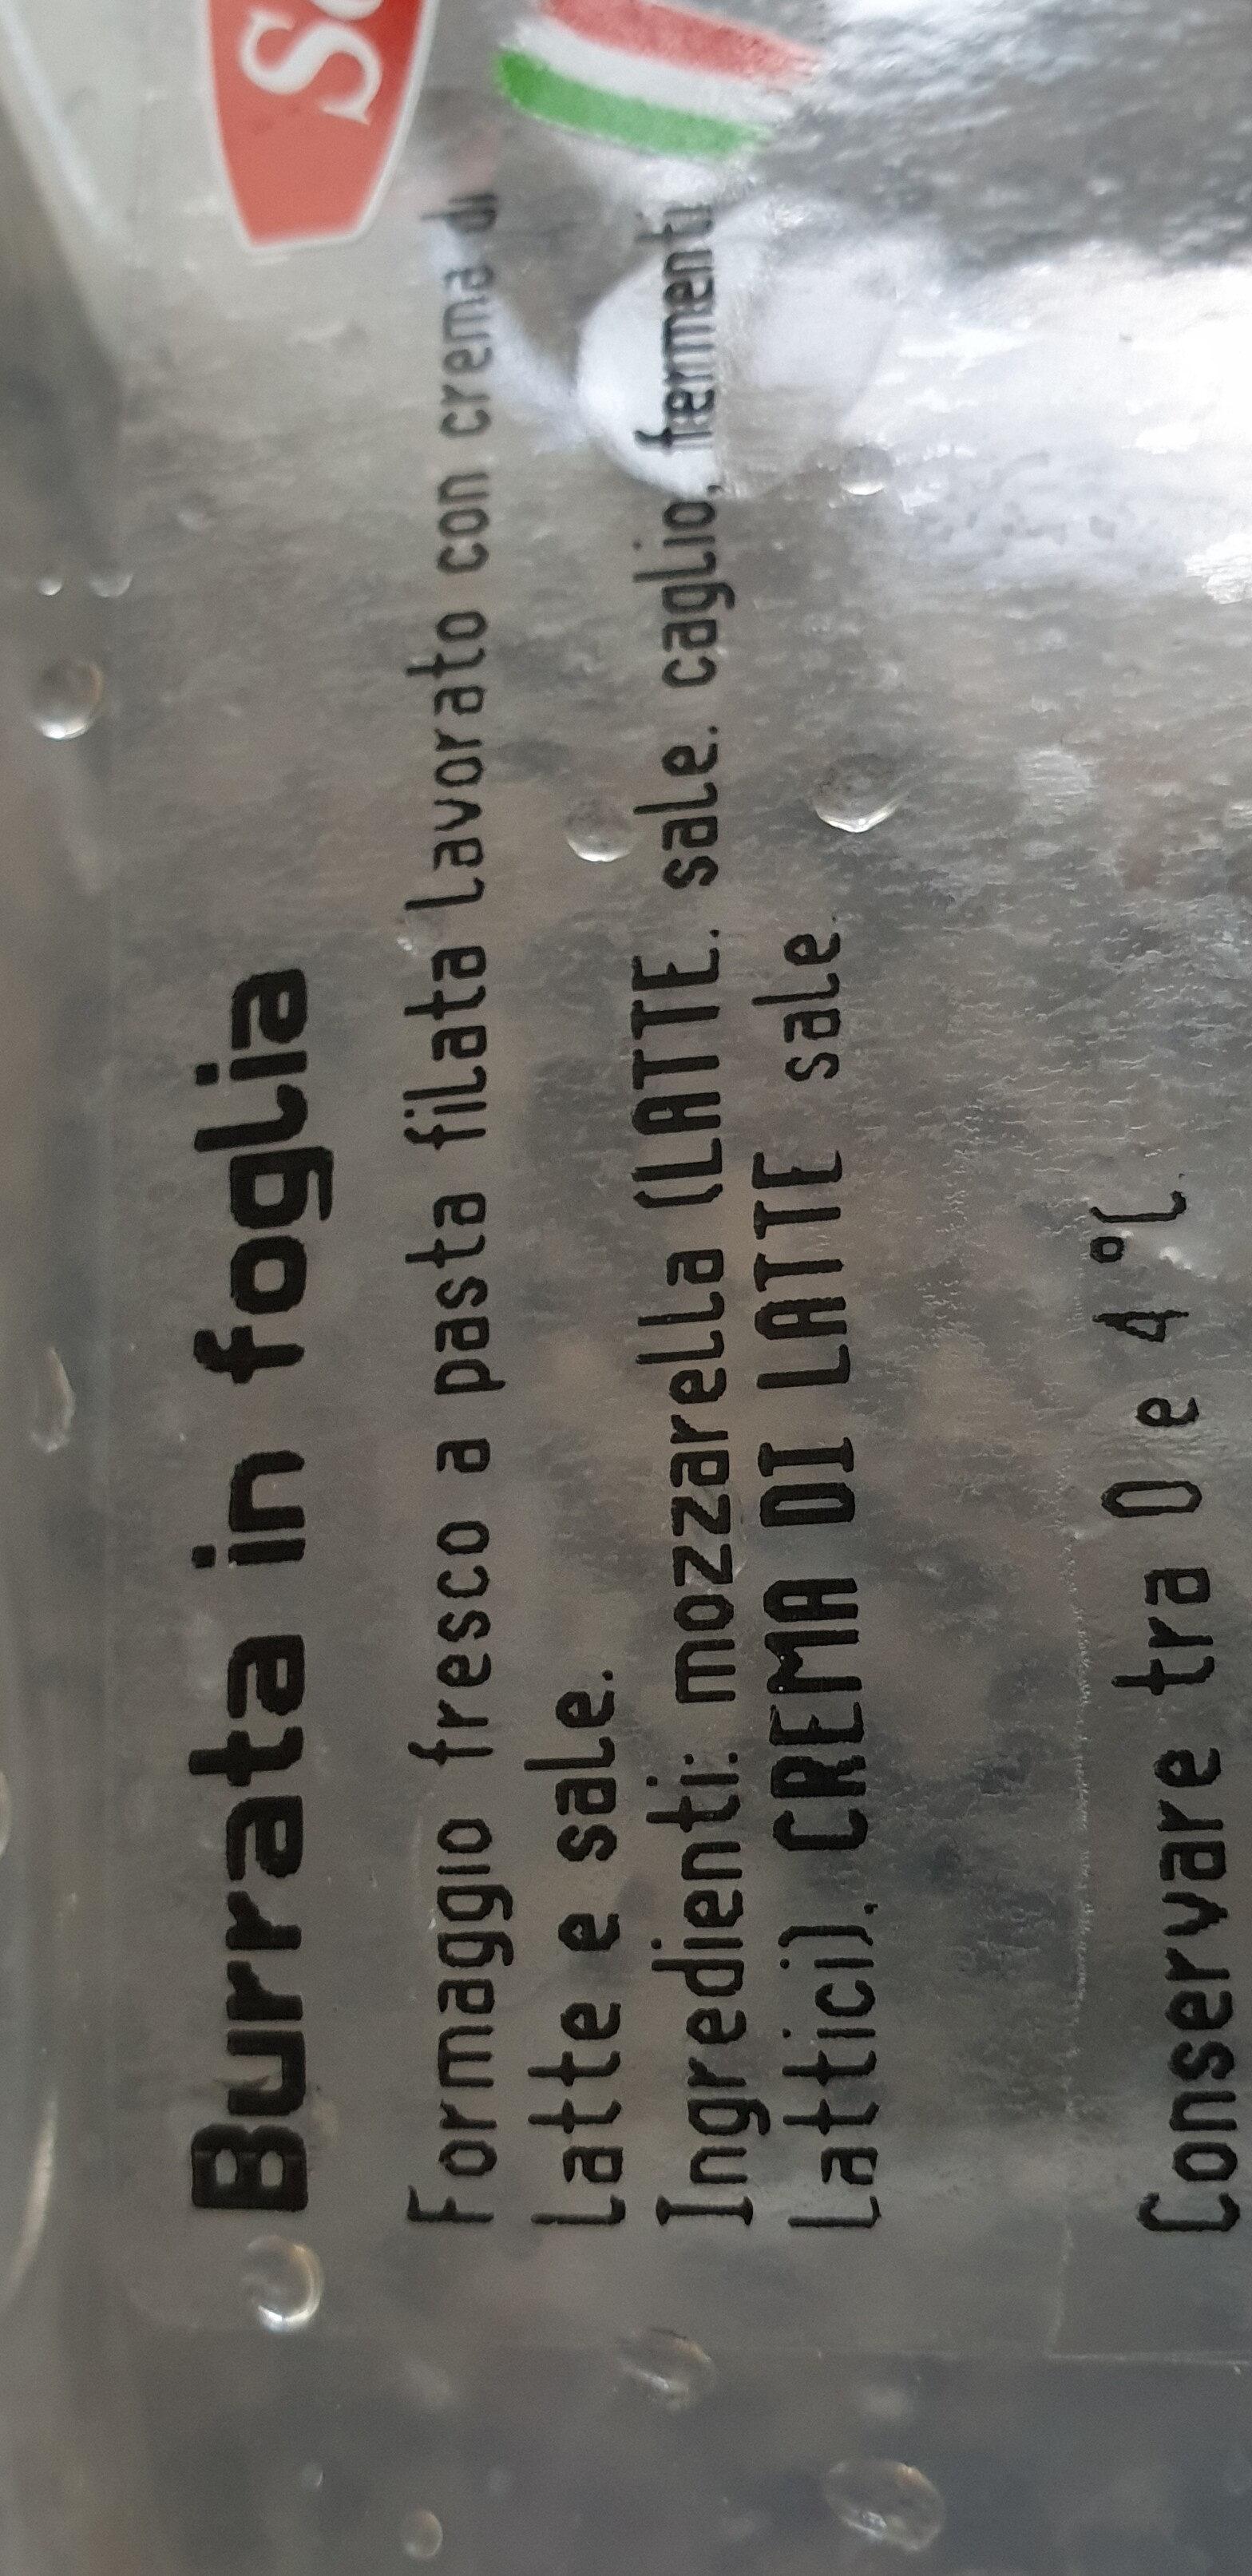 Burrata in foglia - Ingredients - it